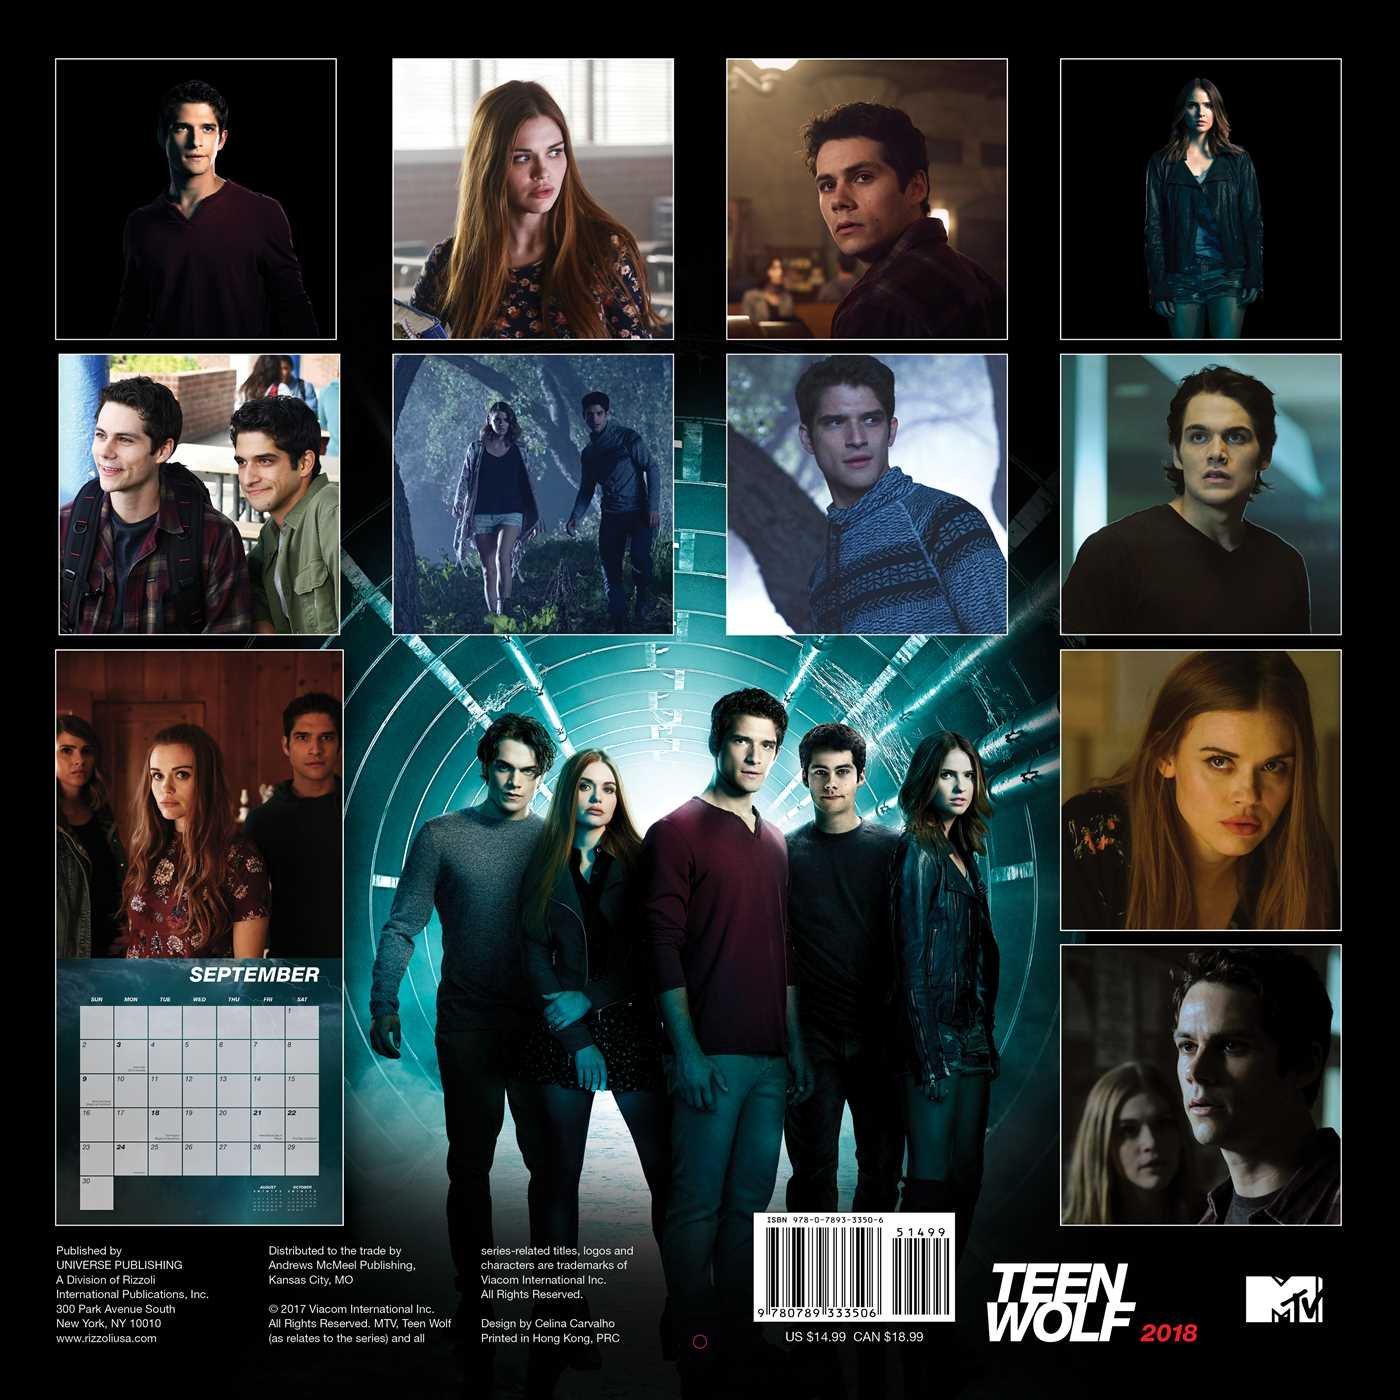 Teen Wolf 2018 Wall Calendar: MTV/Viacom: 0676728033509: Amazon